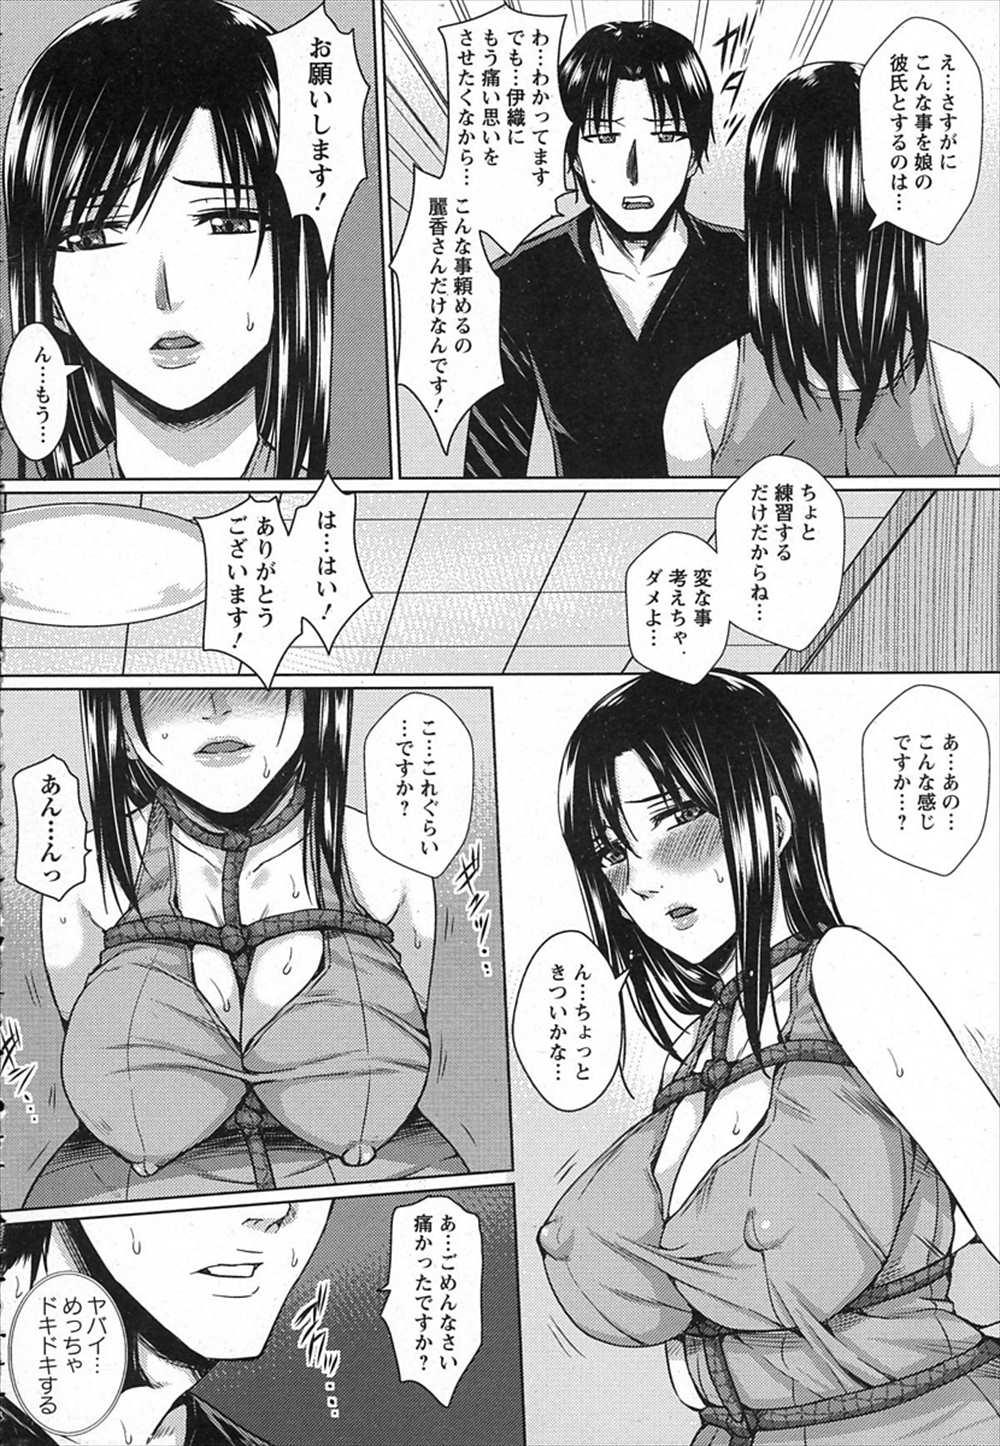 <i>カラオケ 女性 盛り上がる</i>